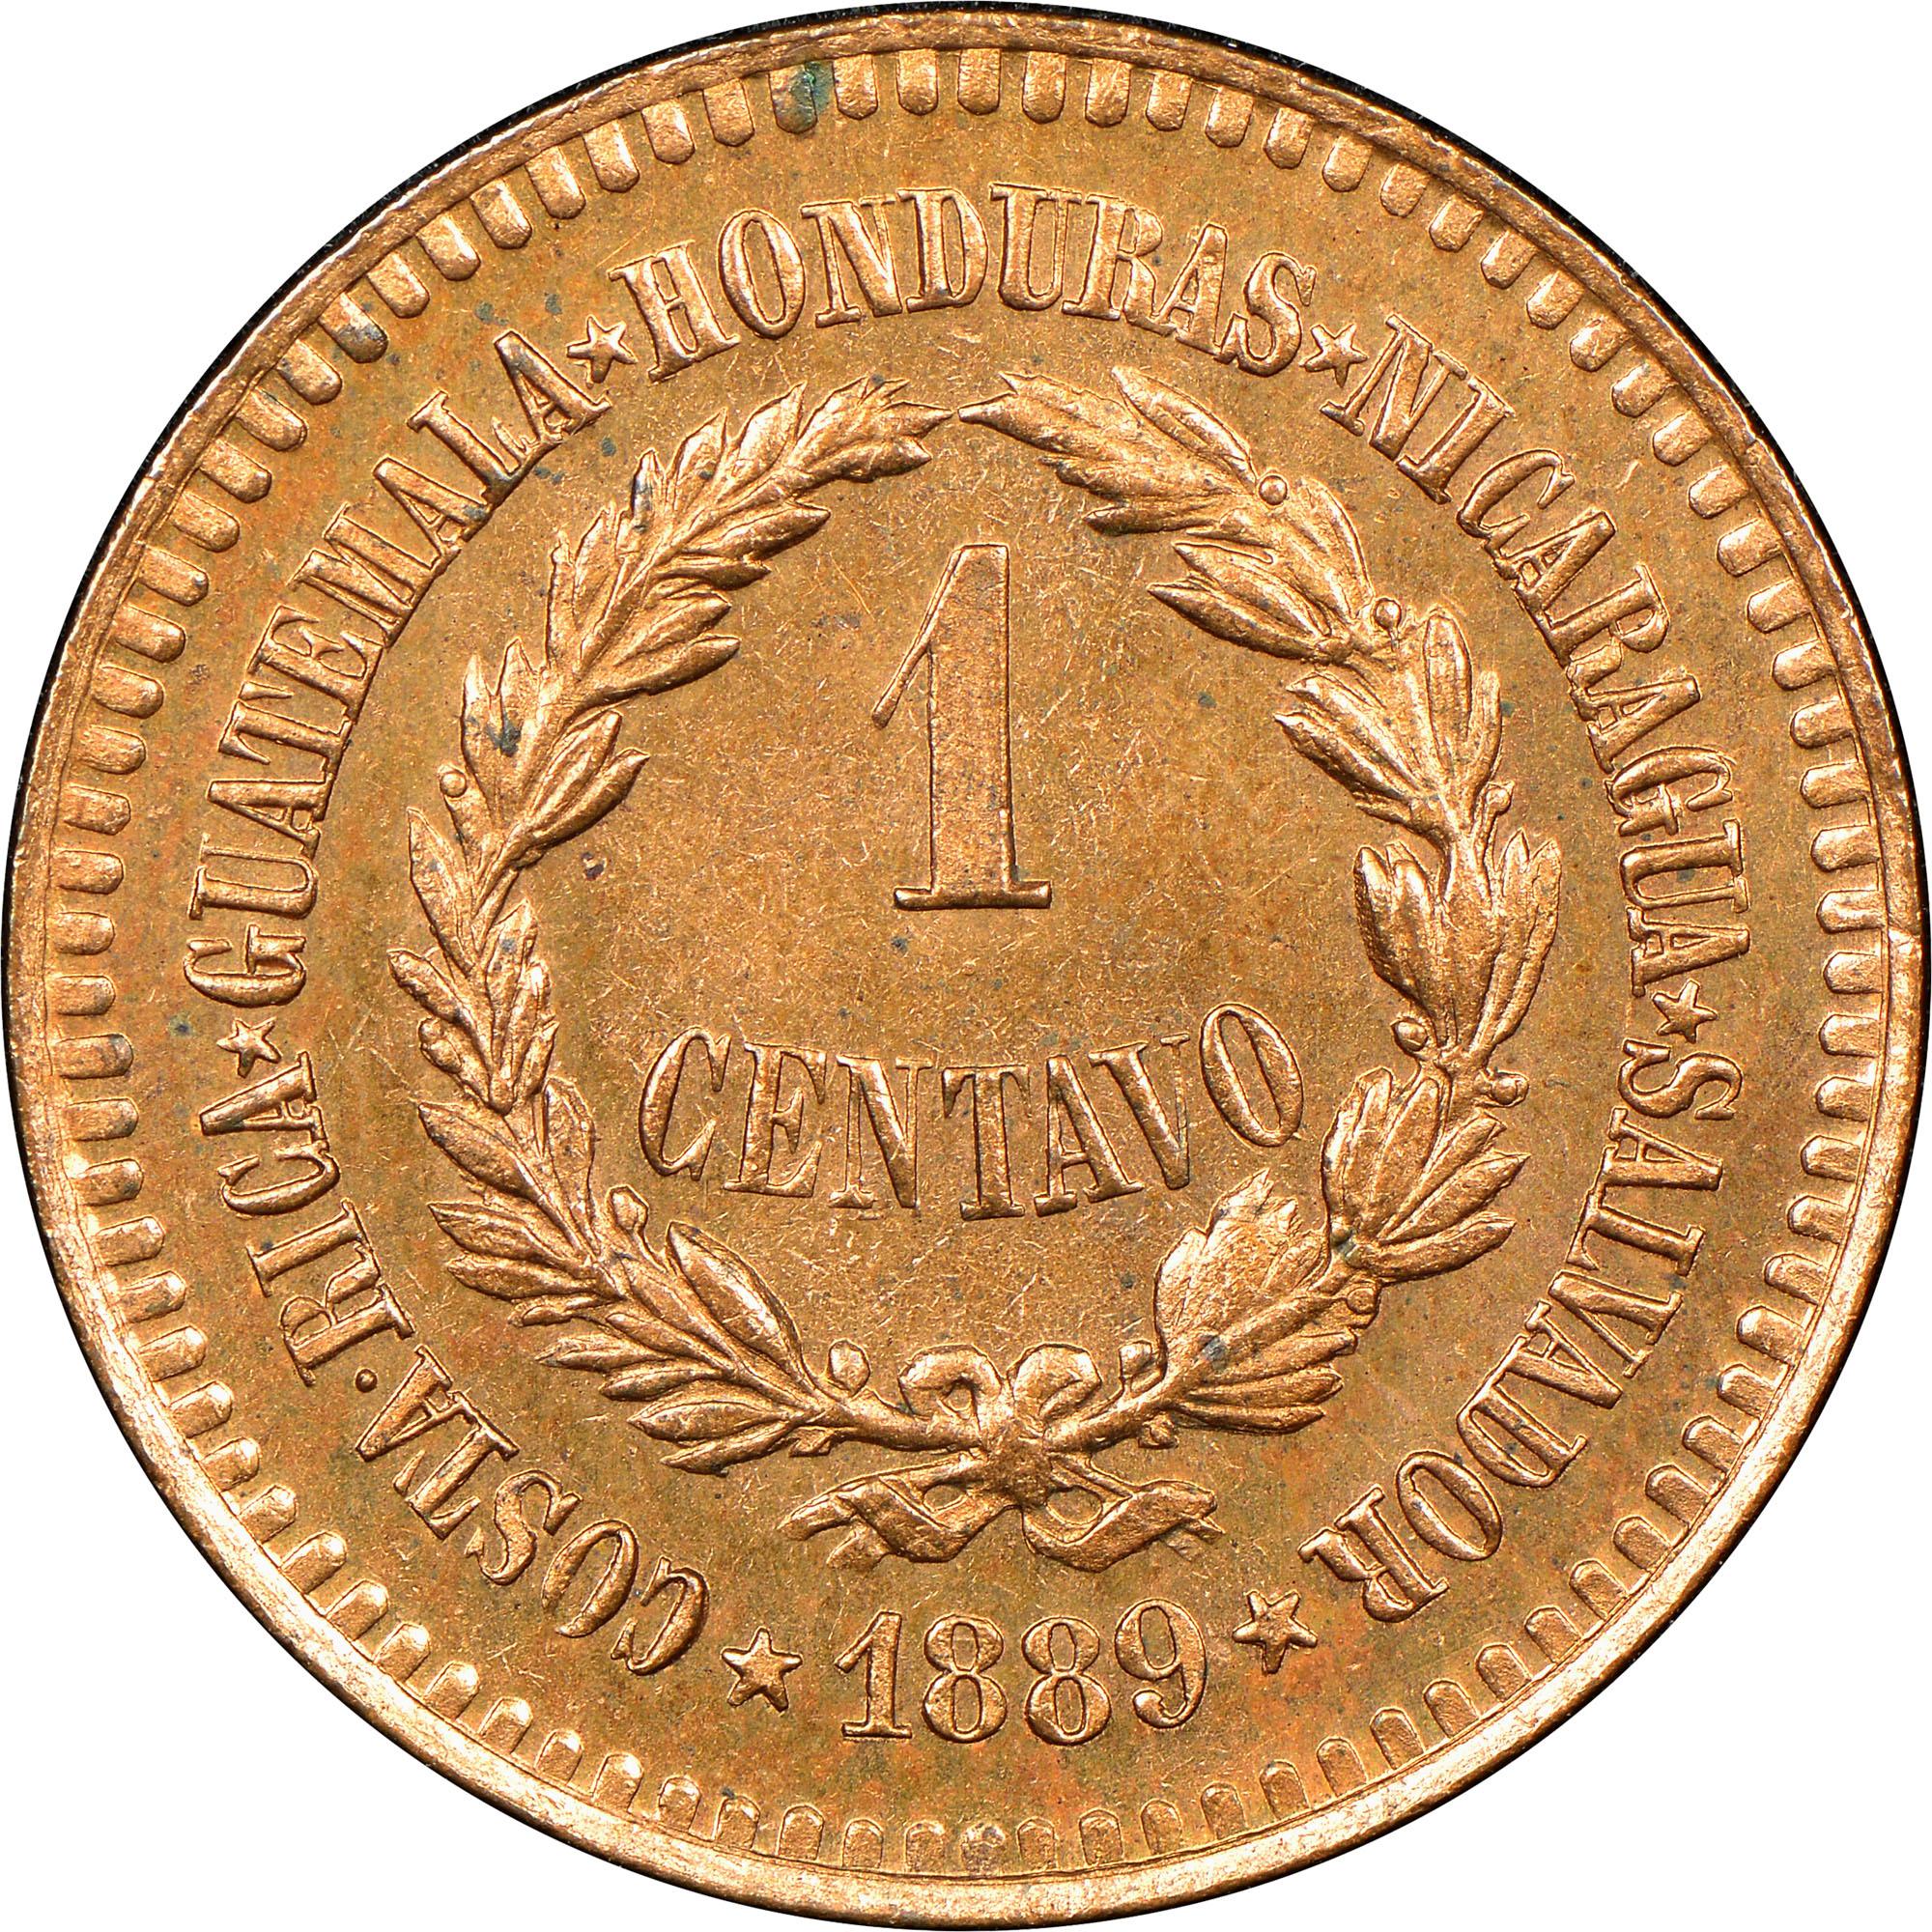 1889 Central American Union Centavo reverse